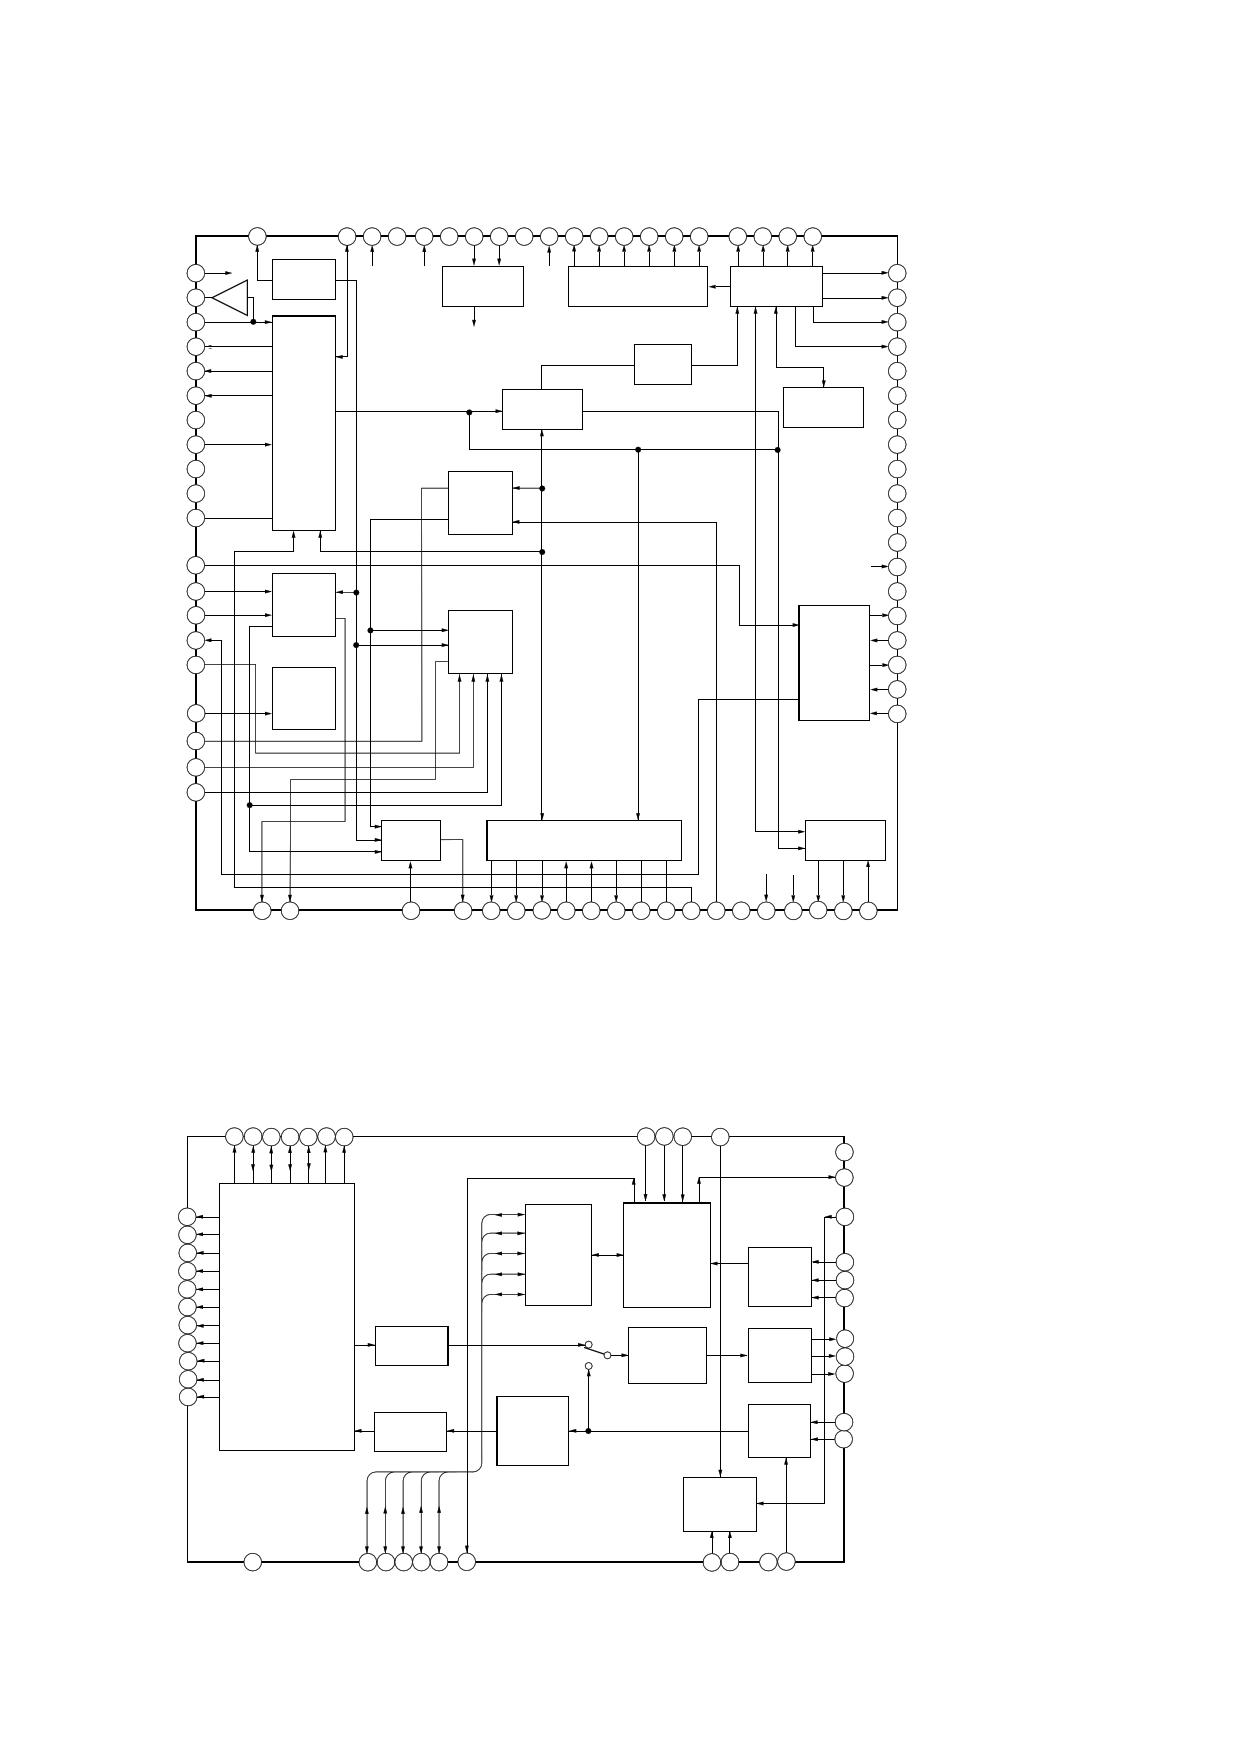 D-E504 pdf